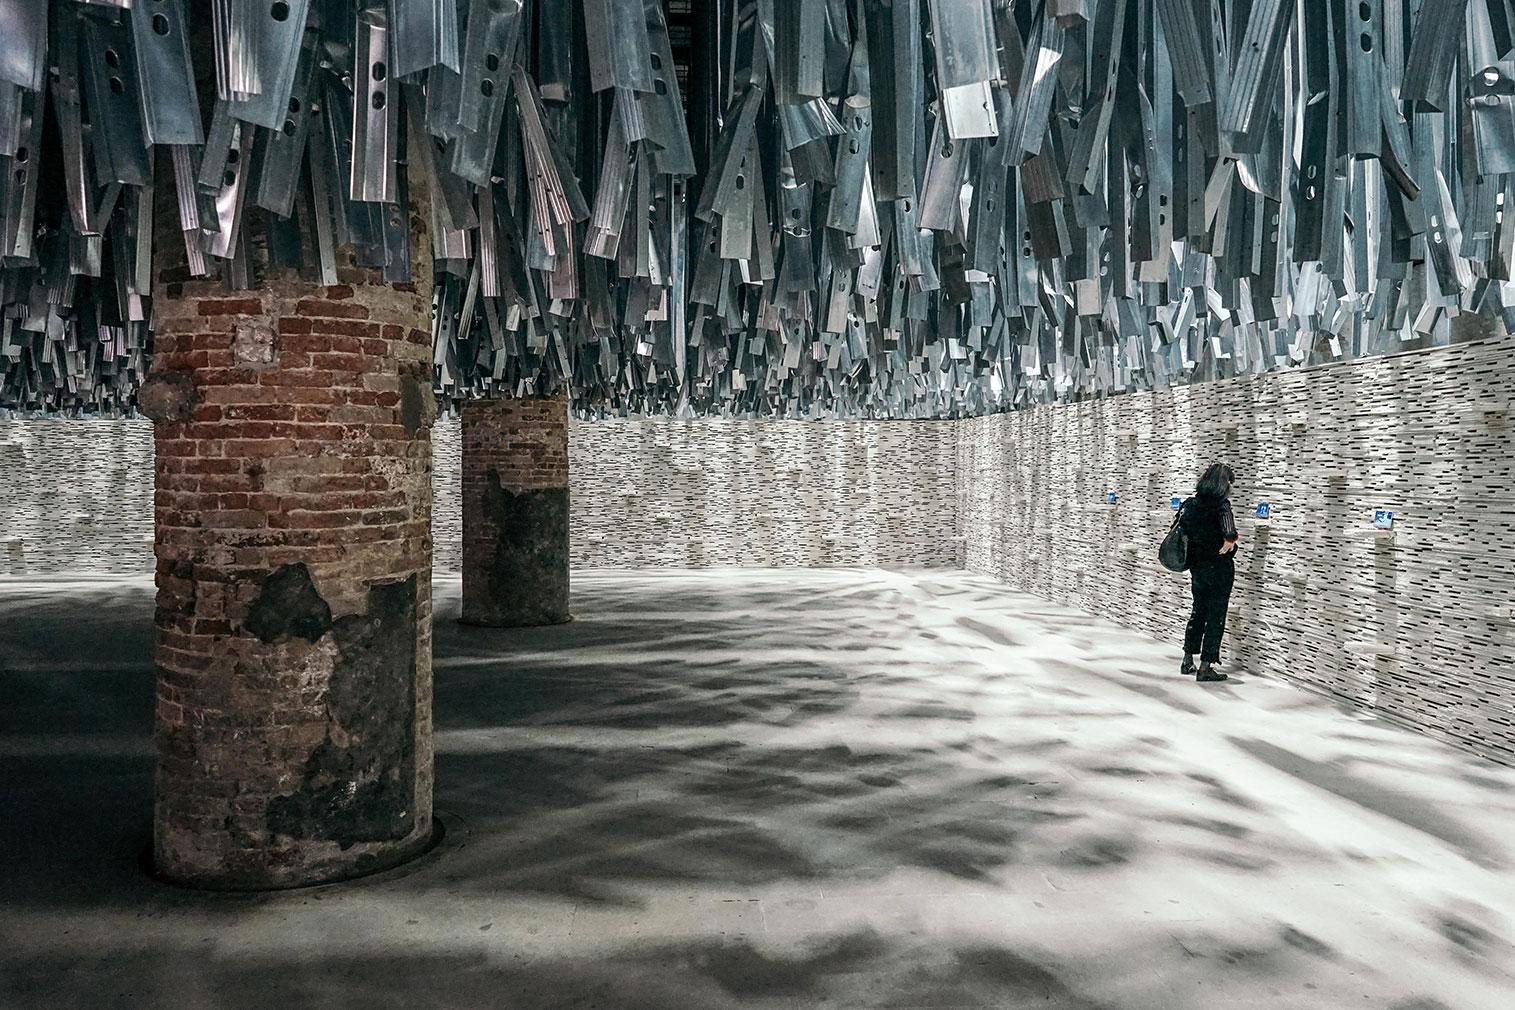 Venice architecture biennale 39 s 5 hot topics for Biennale venezia 2016